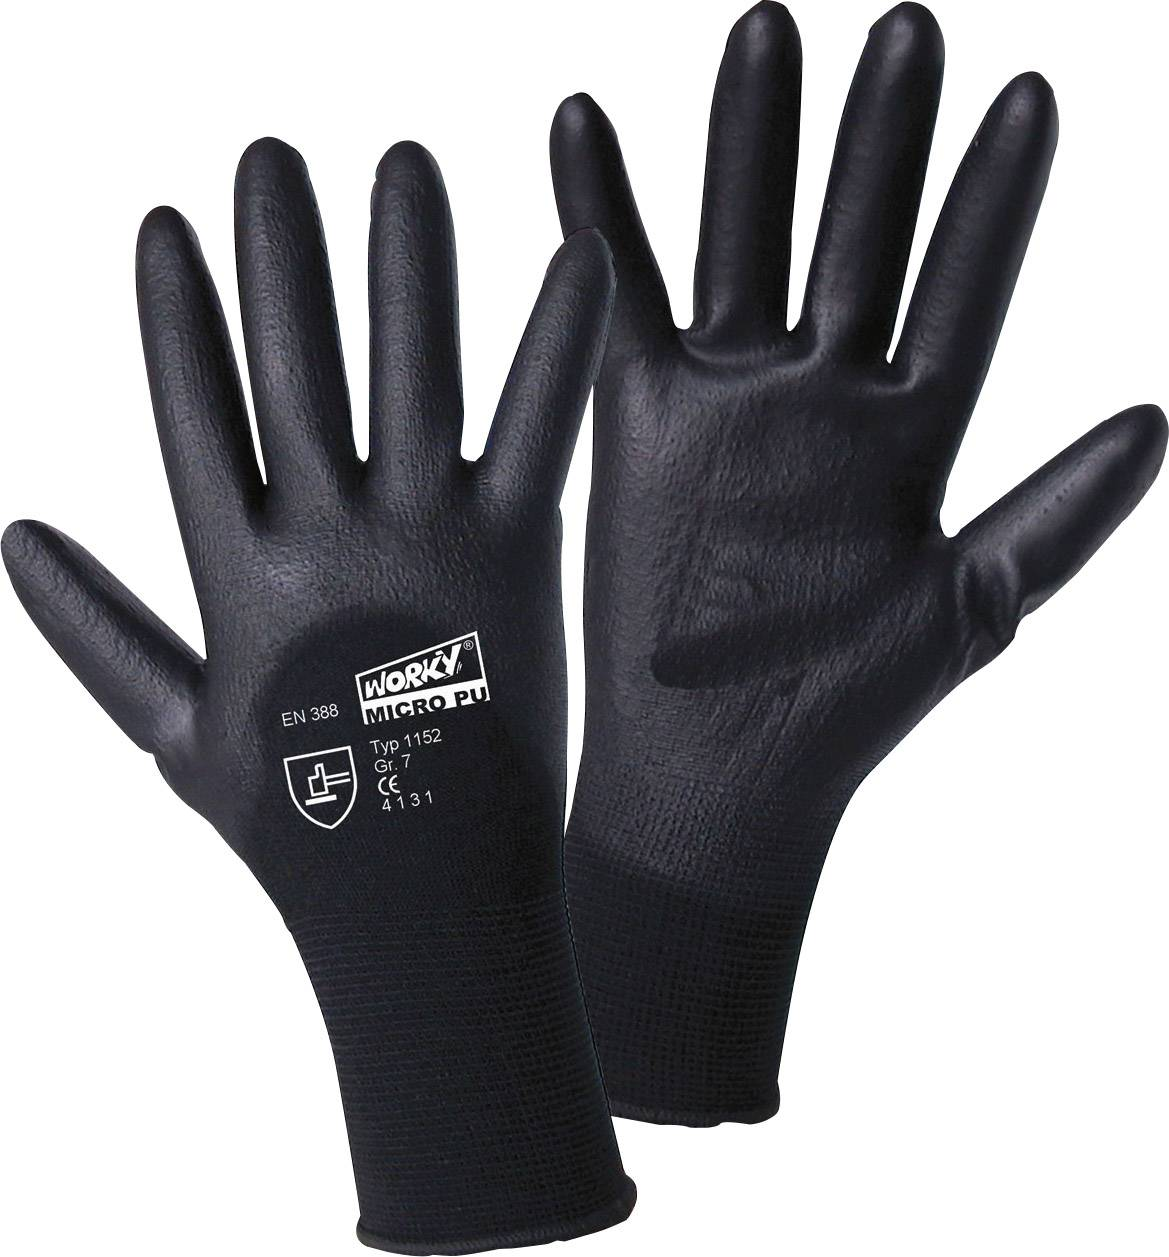 Pracovné rukavice worky MICRO black 1152, velikost rukavic: 8, M